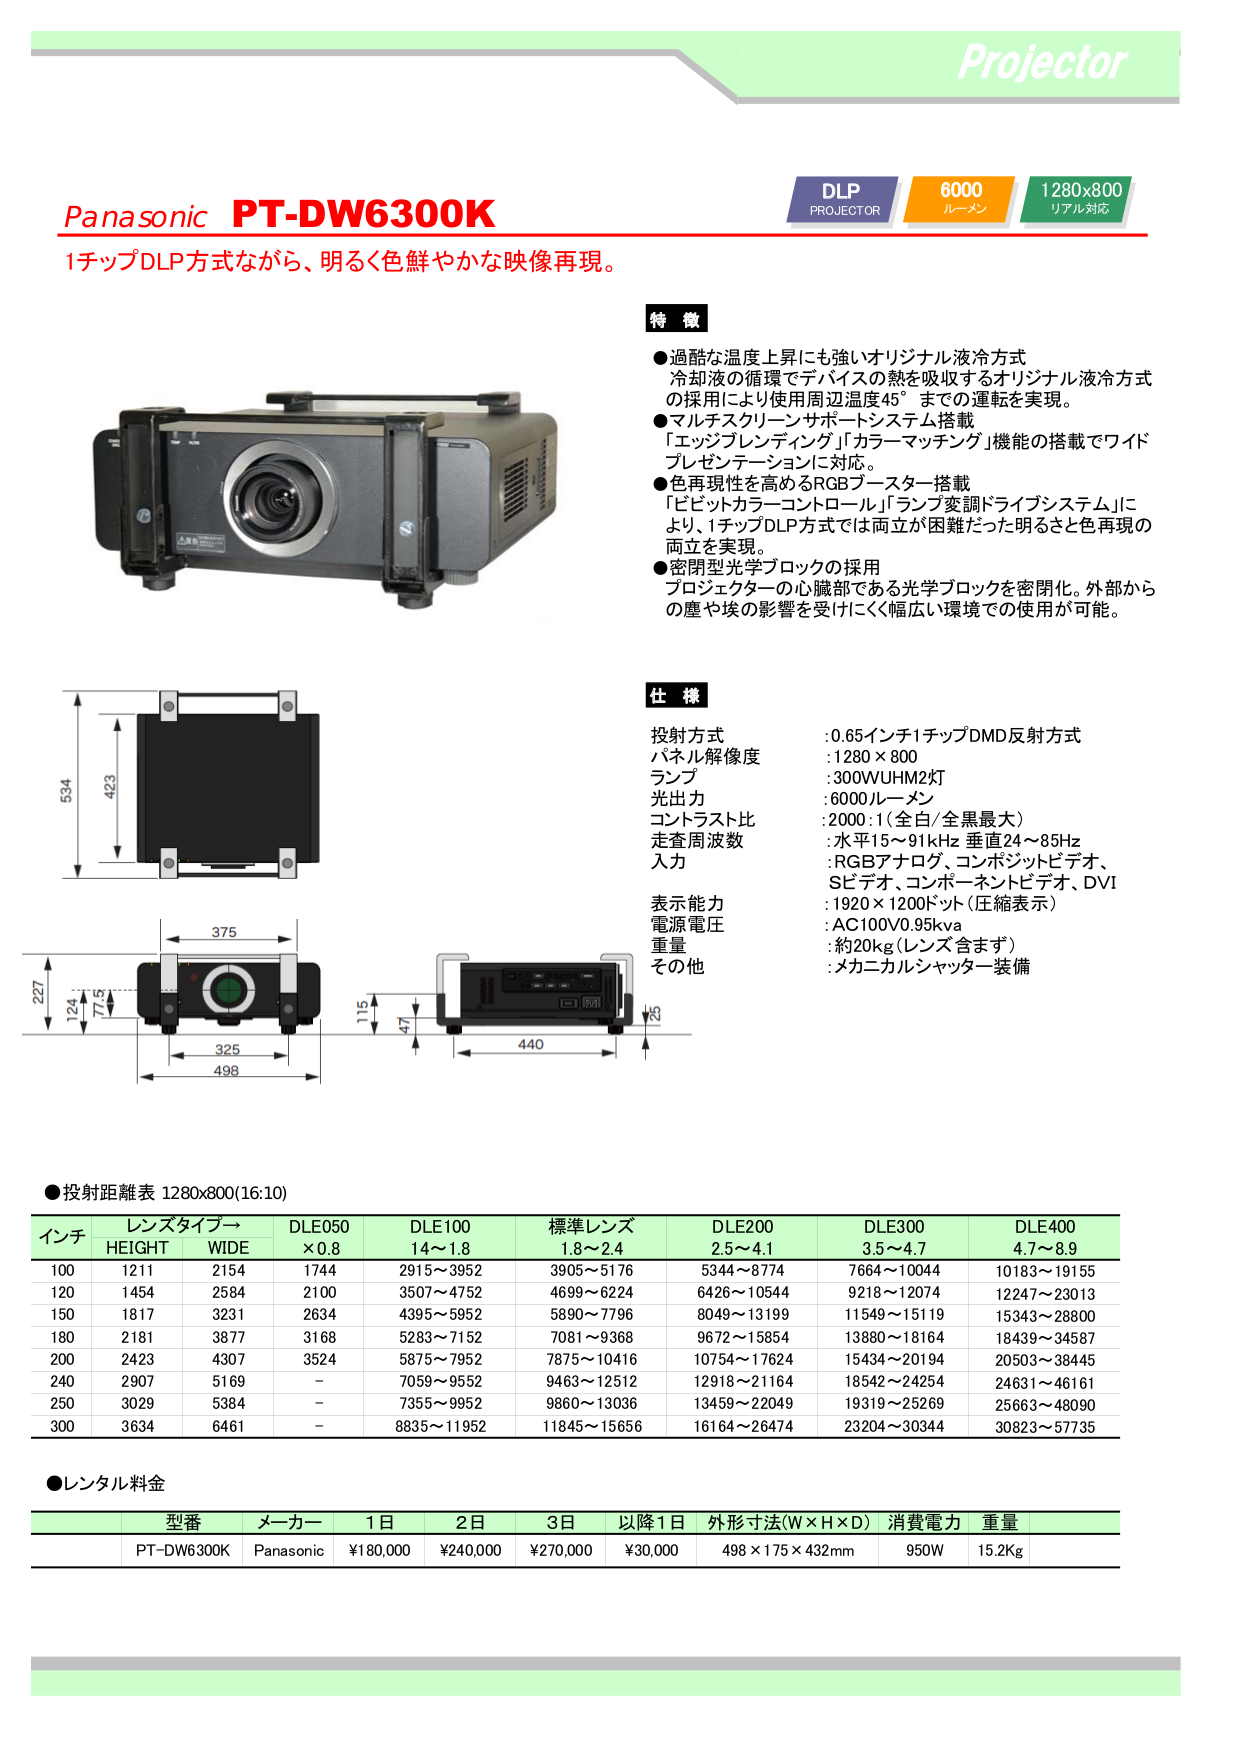 pdf for Panasonic Projector PT-DW6300K manual